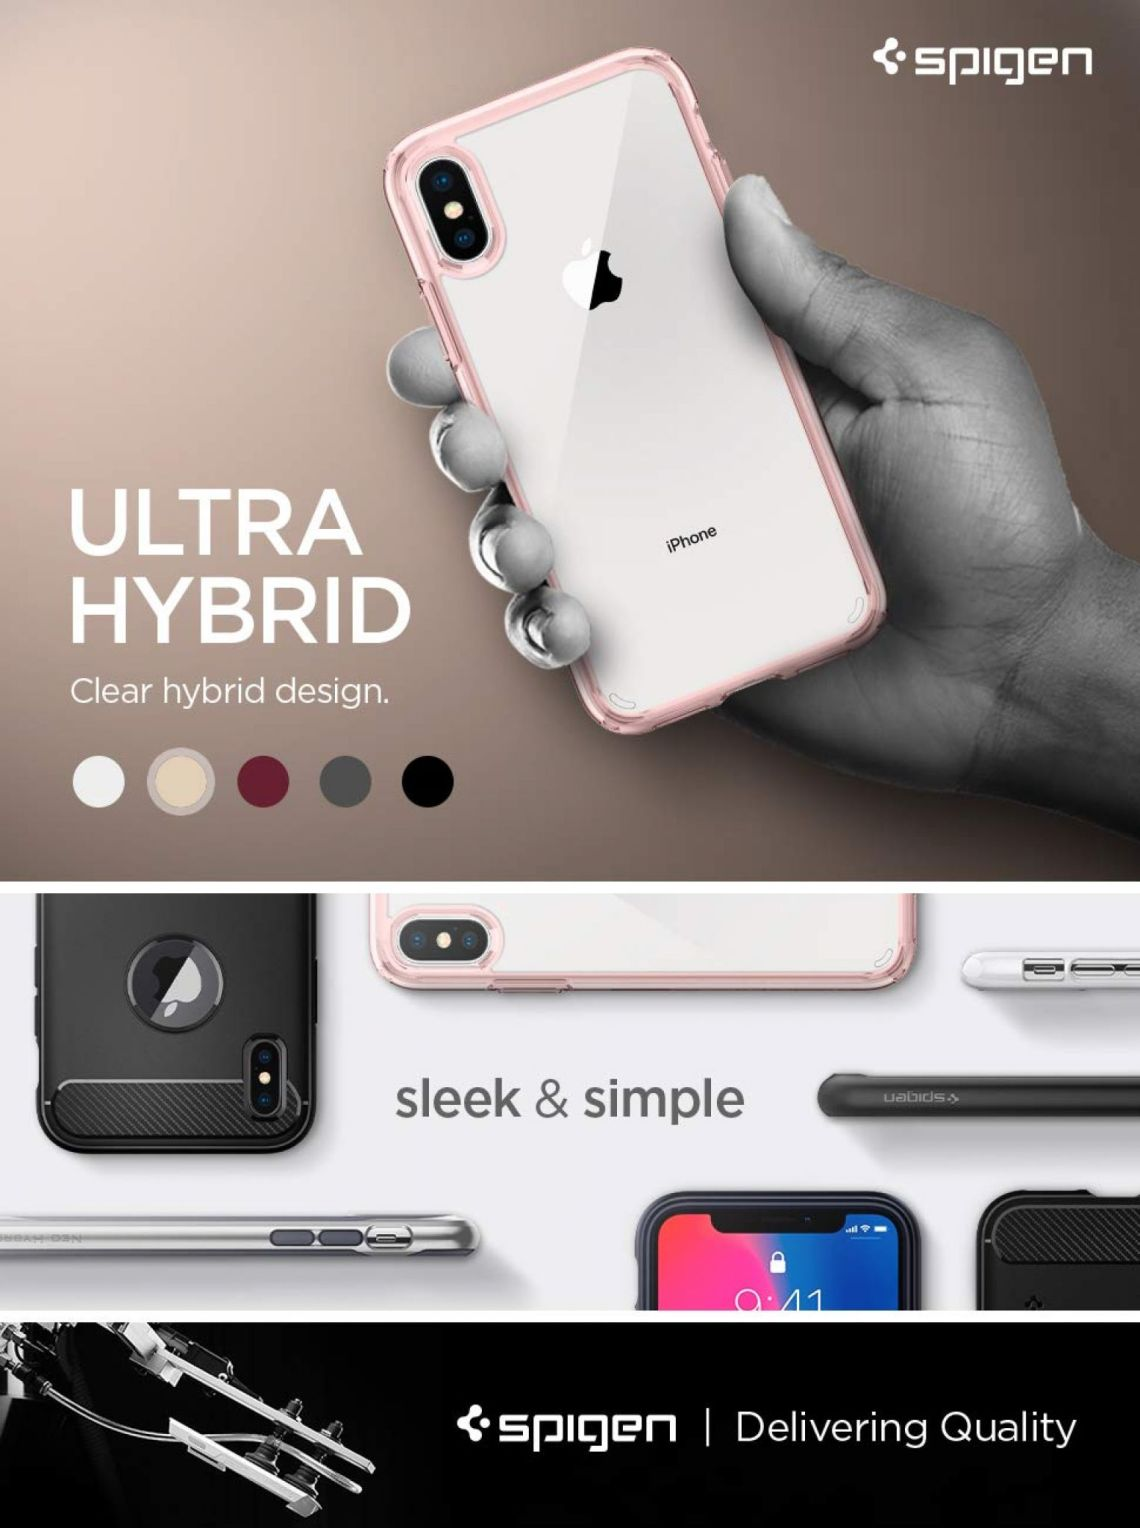 Amazon.com: Spigen Ultra Hybrid Designed for Apple iPhone XS Case (2018) / Designed for Apple iPhone X Case (2017) - Rose Crystal: Cell Phones & Accessories